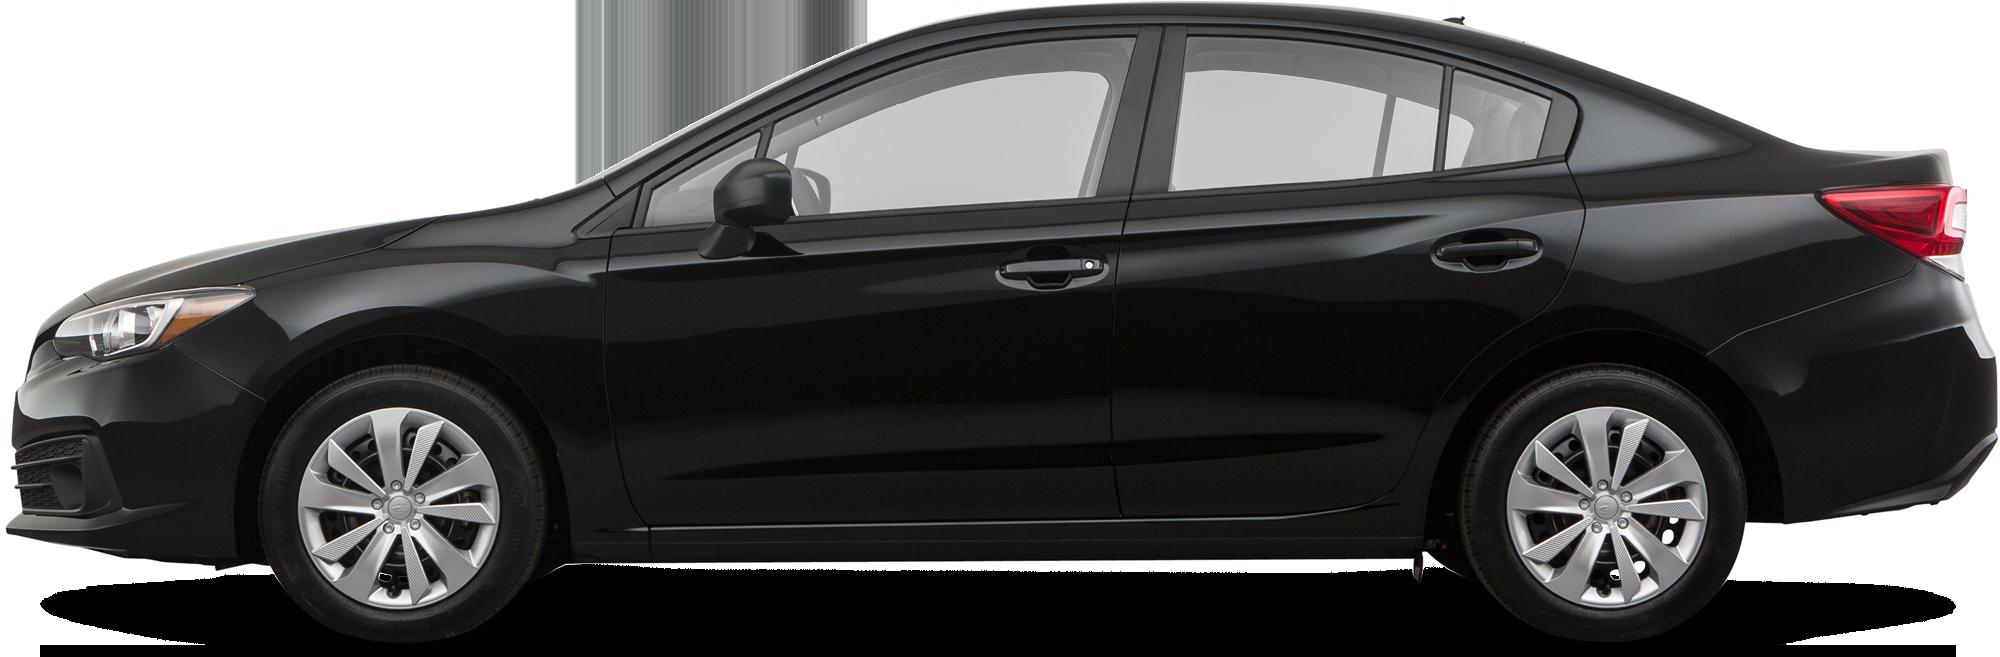 2021 Subaru Impreza Sedan Base Trim Level